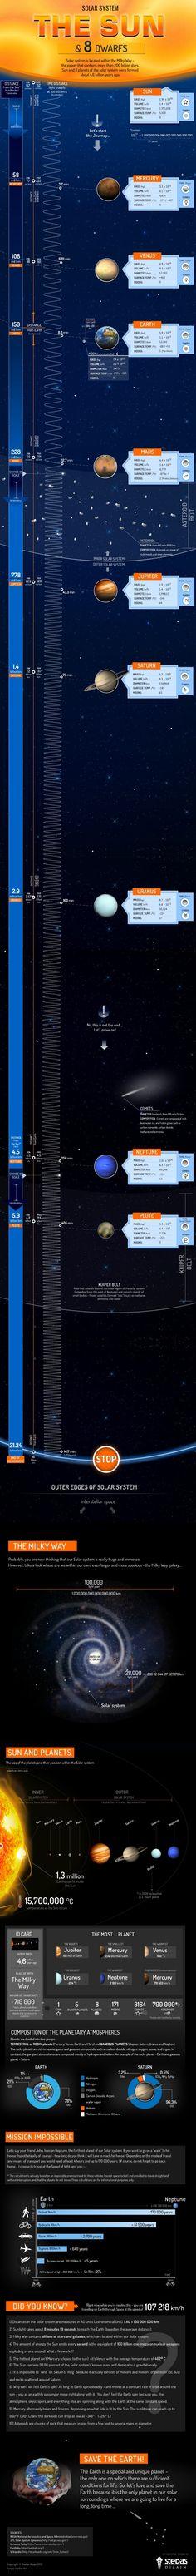 Skykishrain - Solar system. The sun 8 dwarfs